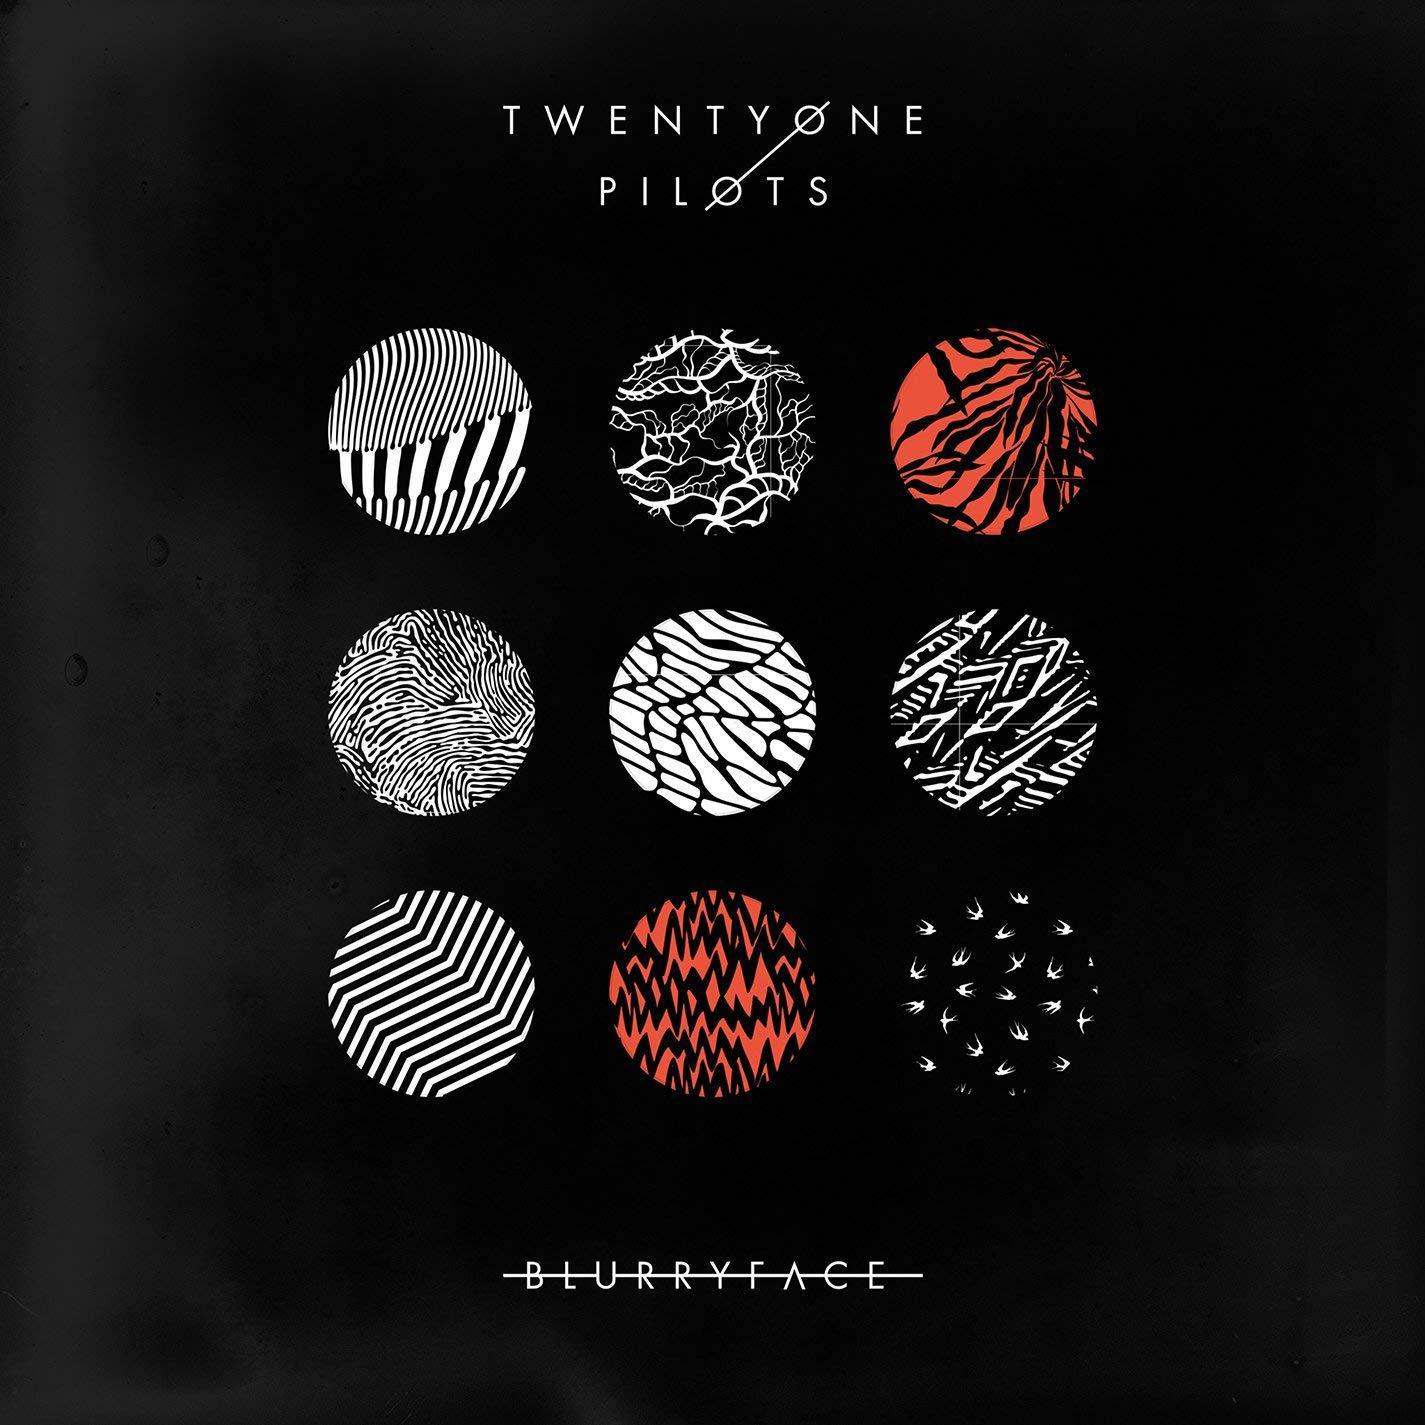 Blurryface : Twenty One Pilots, Twenty One Pilots: Amazon.es: Música